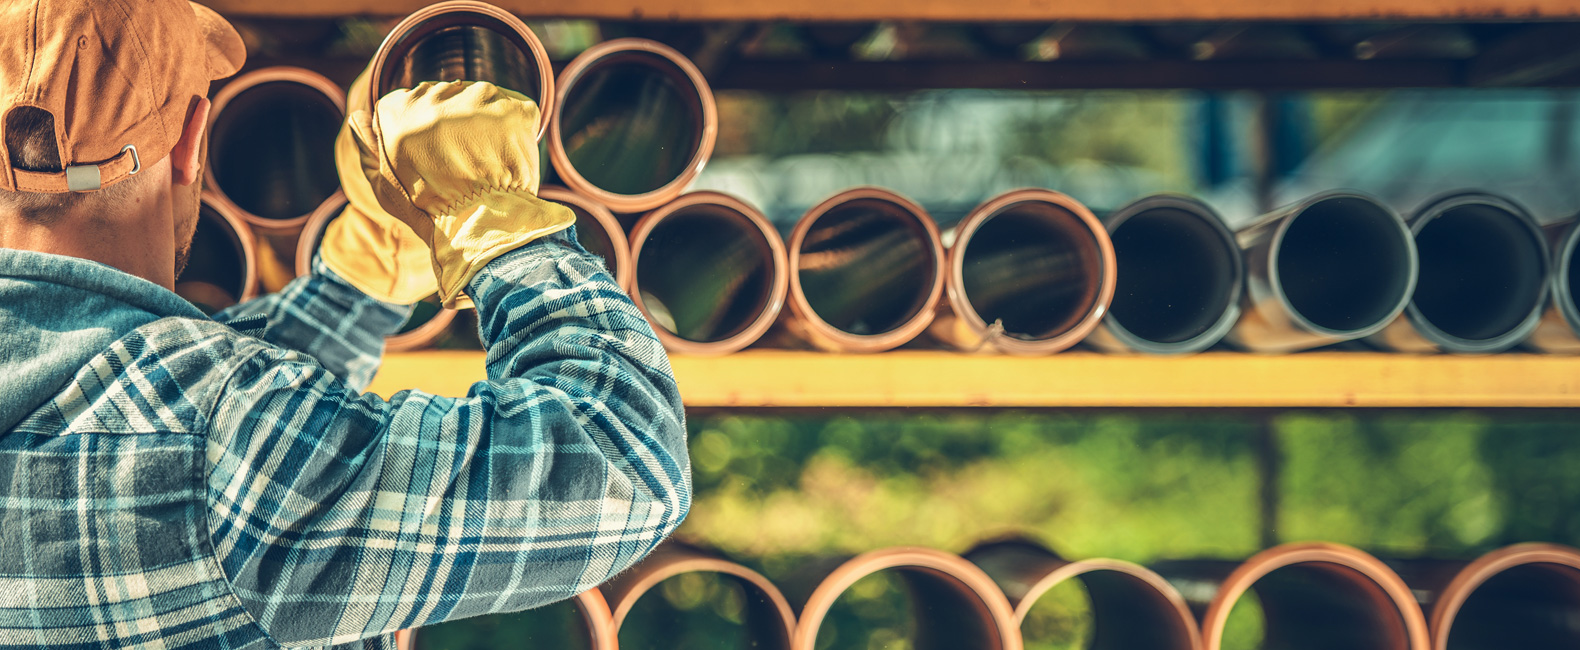 Specialist in Pipeline